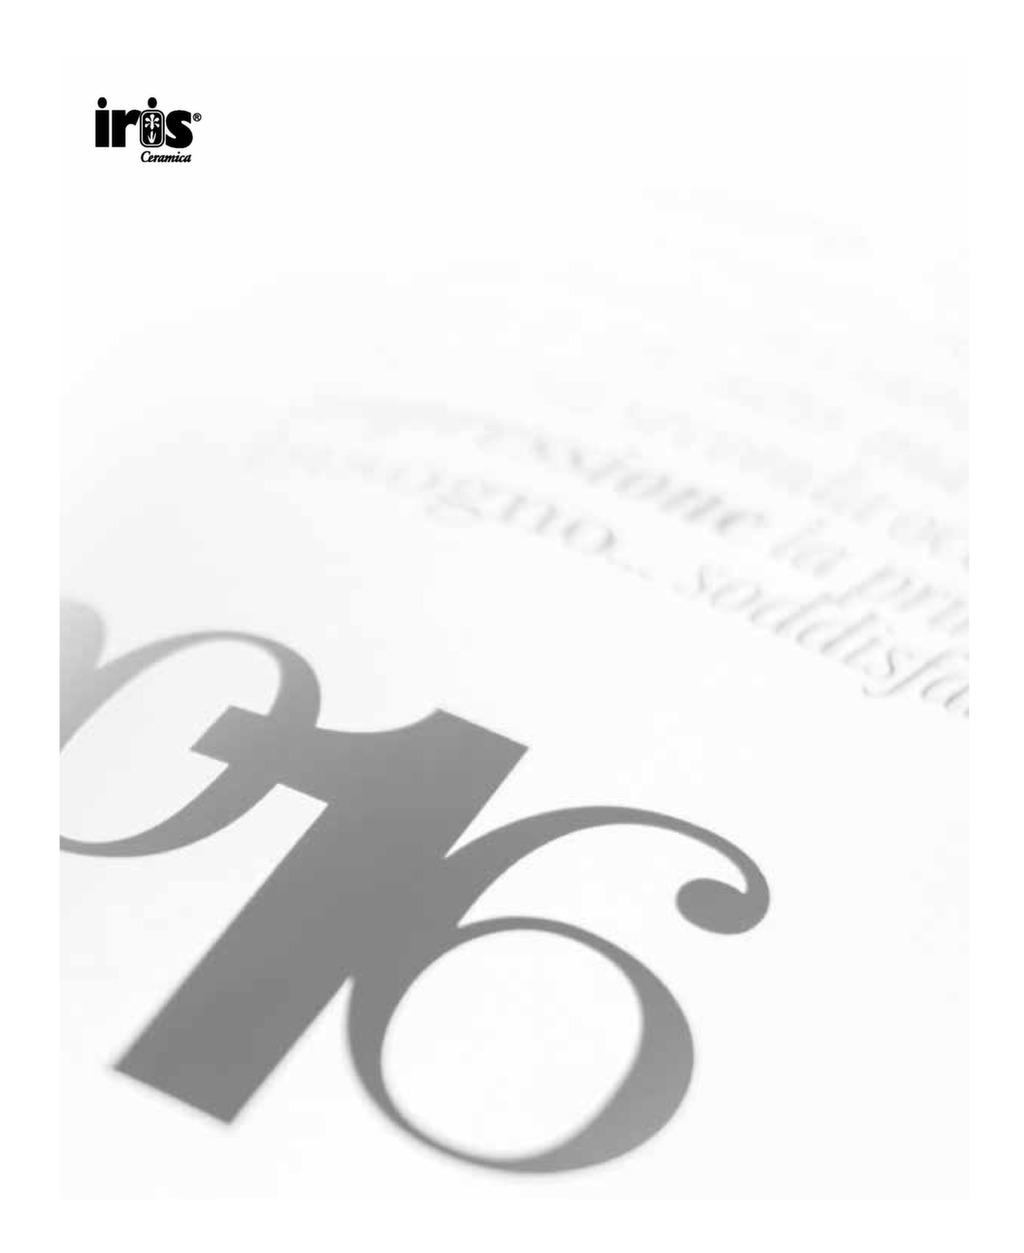 pdf-57850-page-00001.jpg